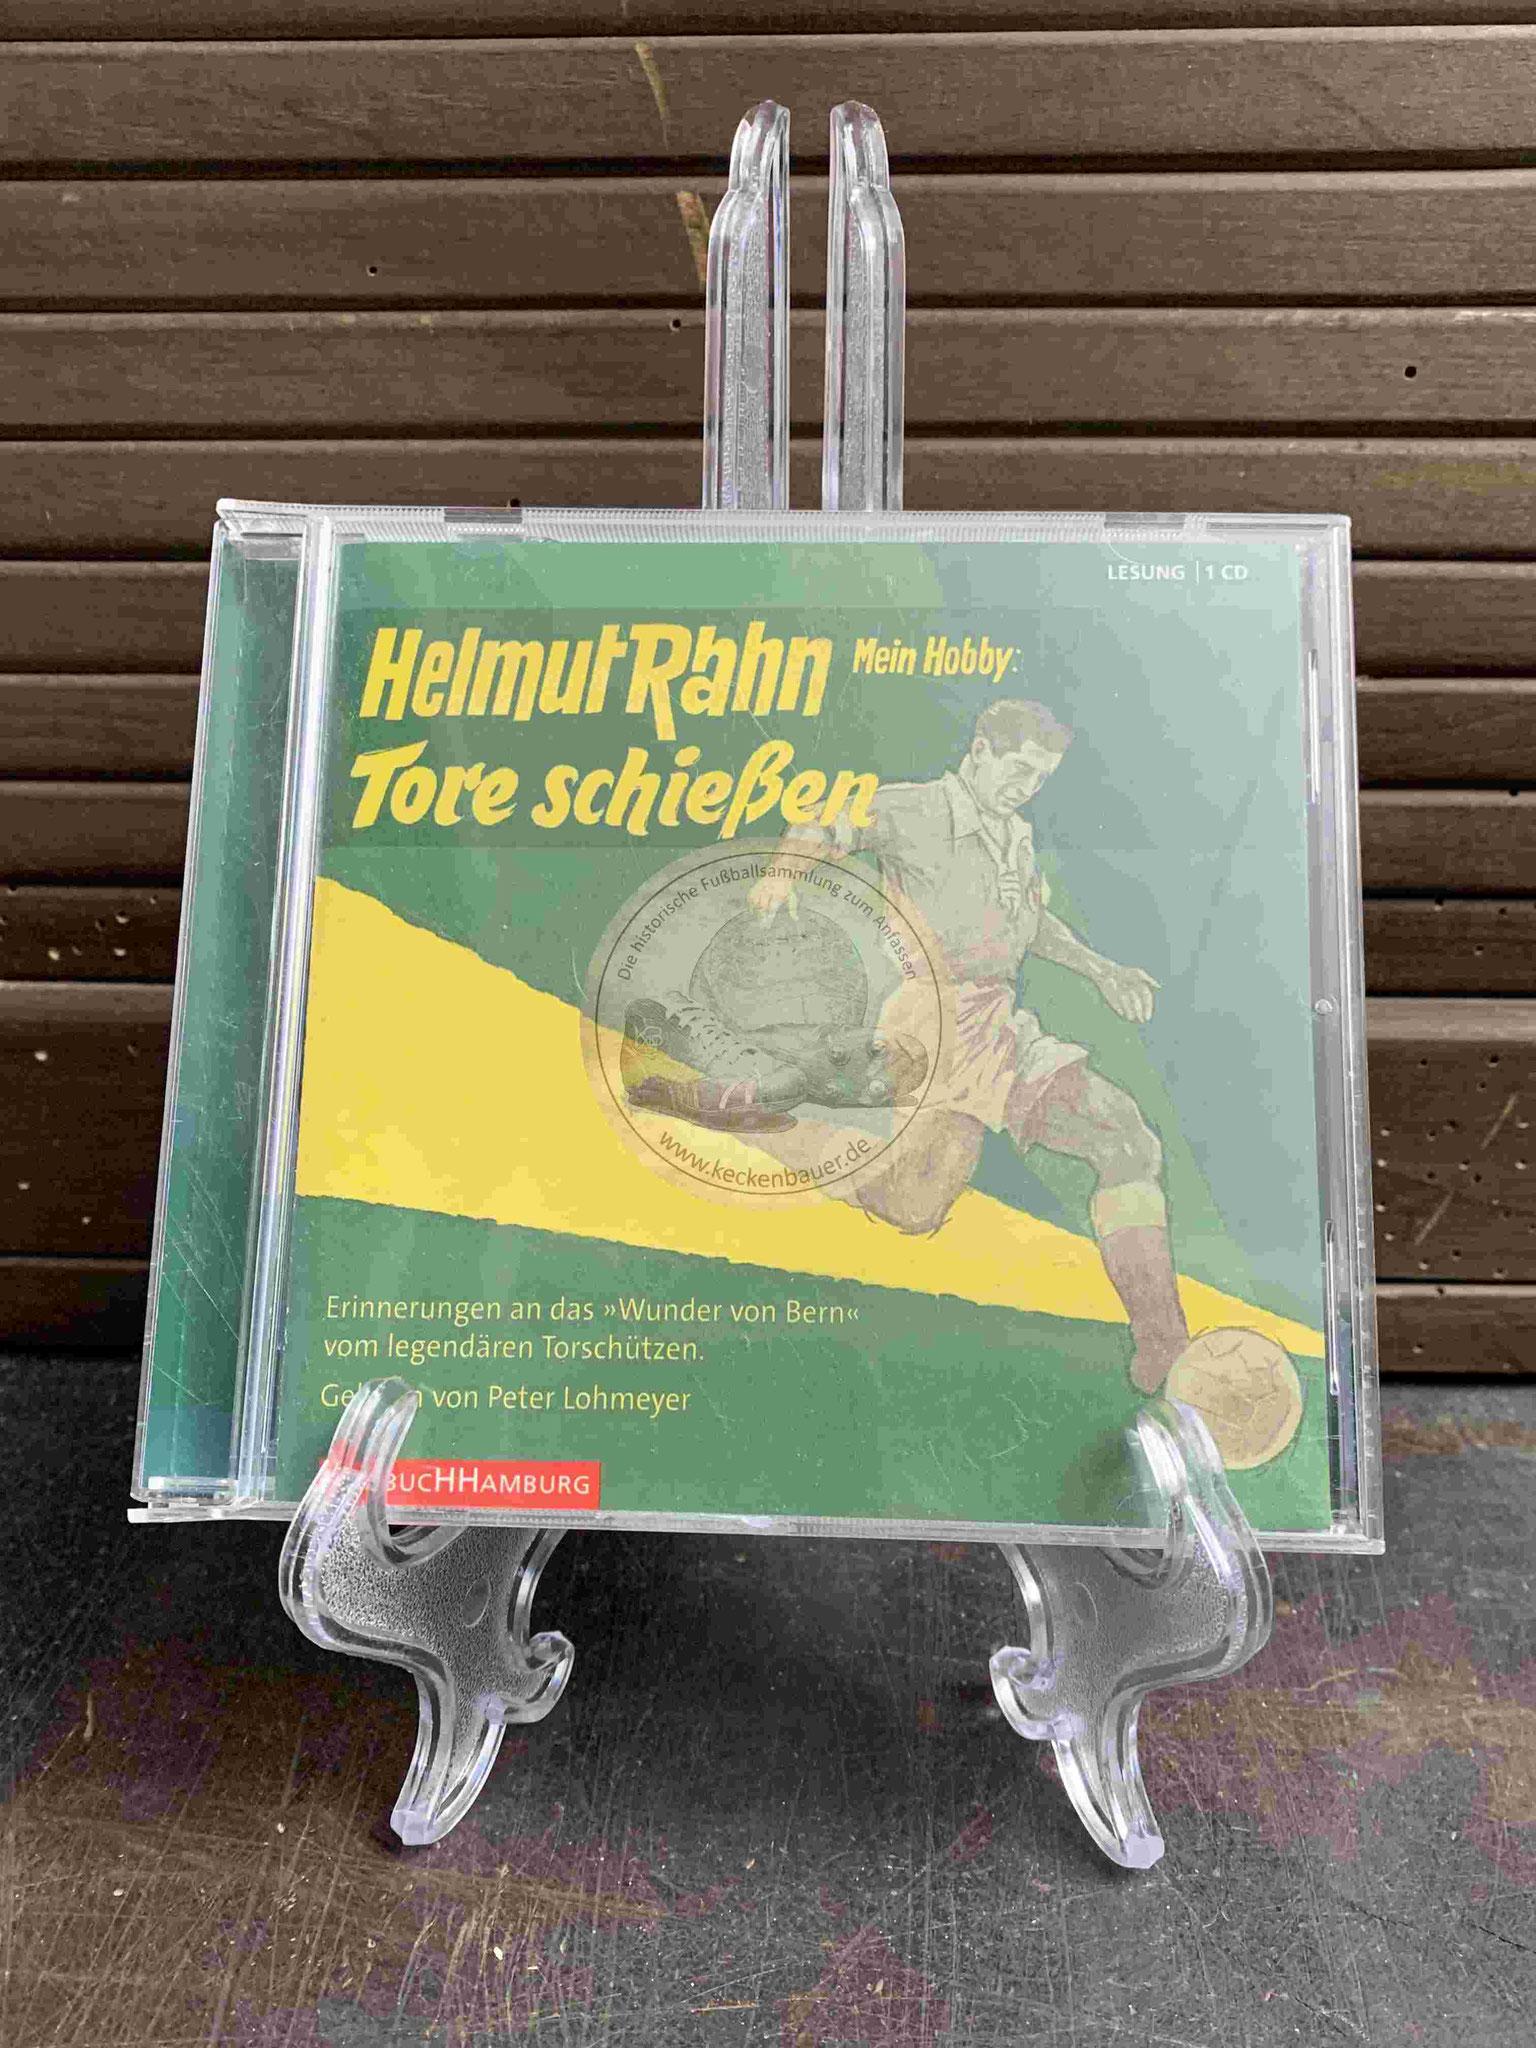 2004 Helmut Rahn Tore schießen